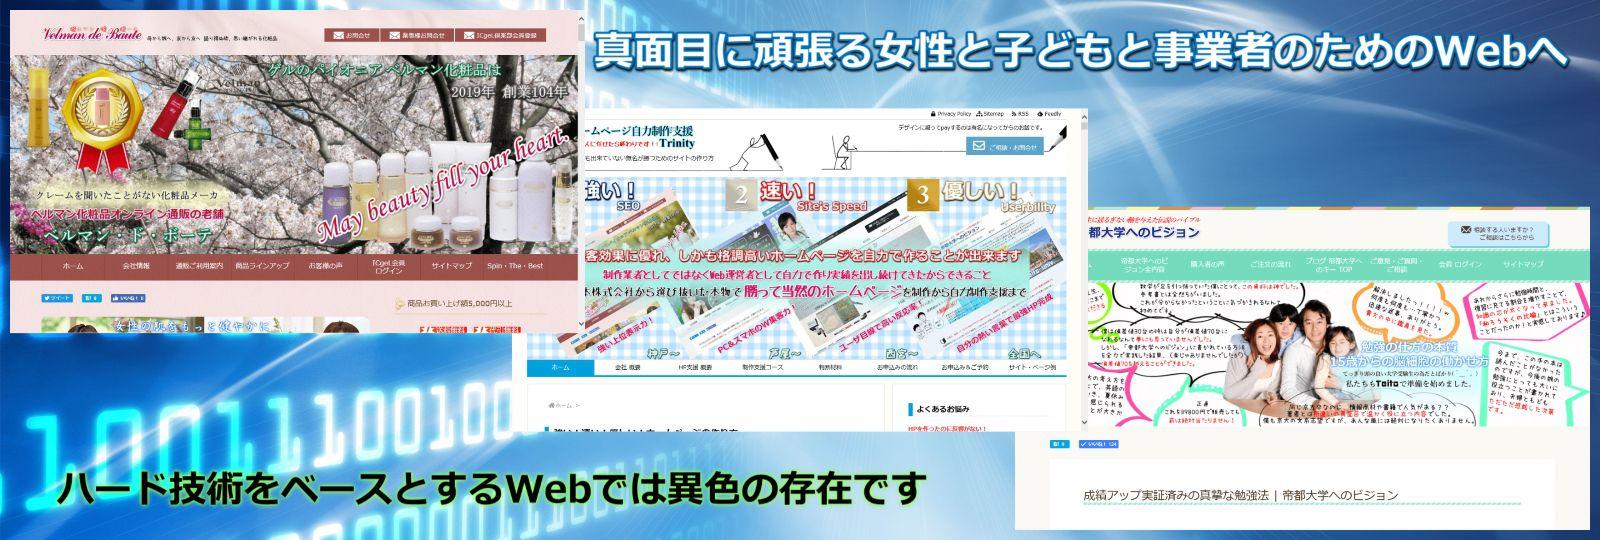 ICL技術事務所 公式サイト メイン画像